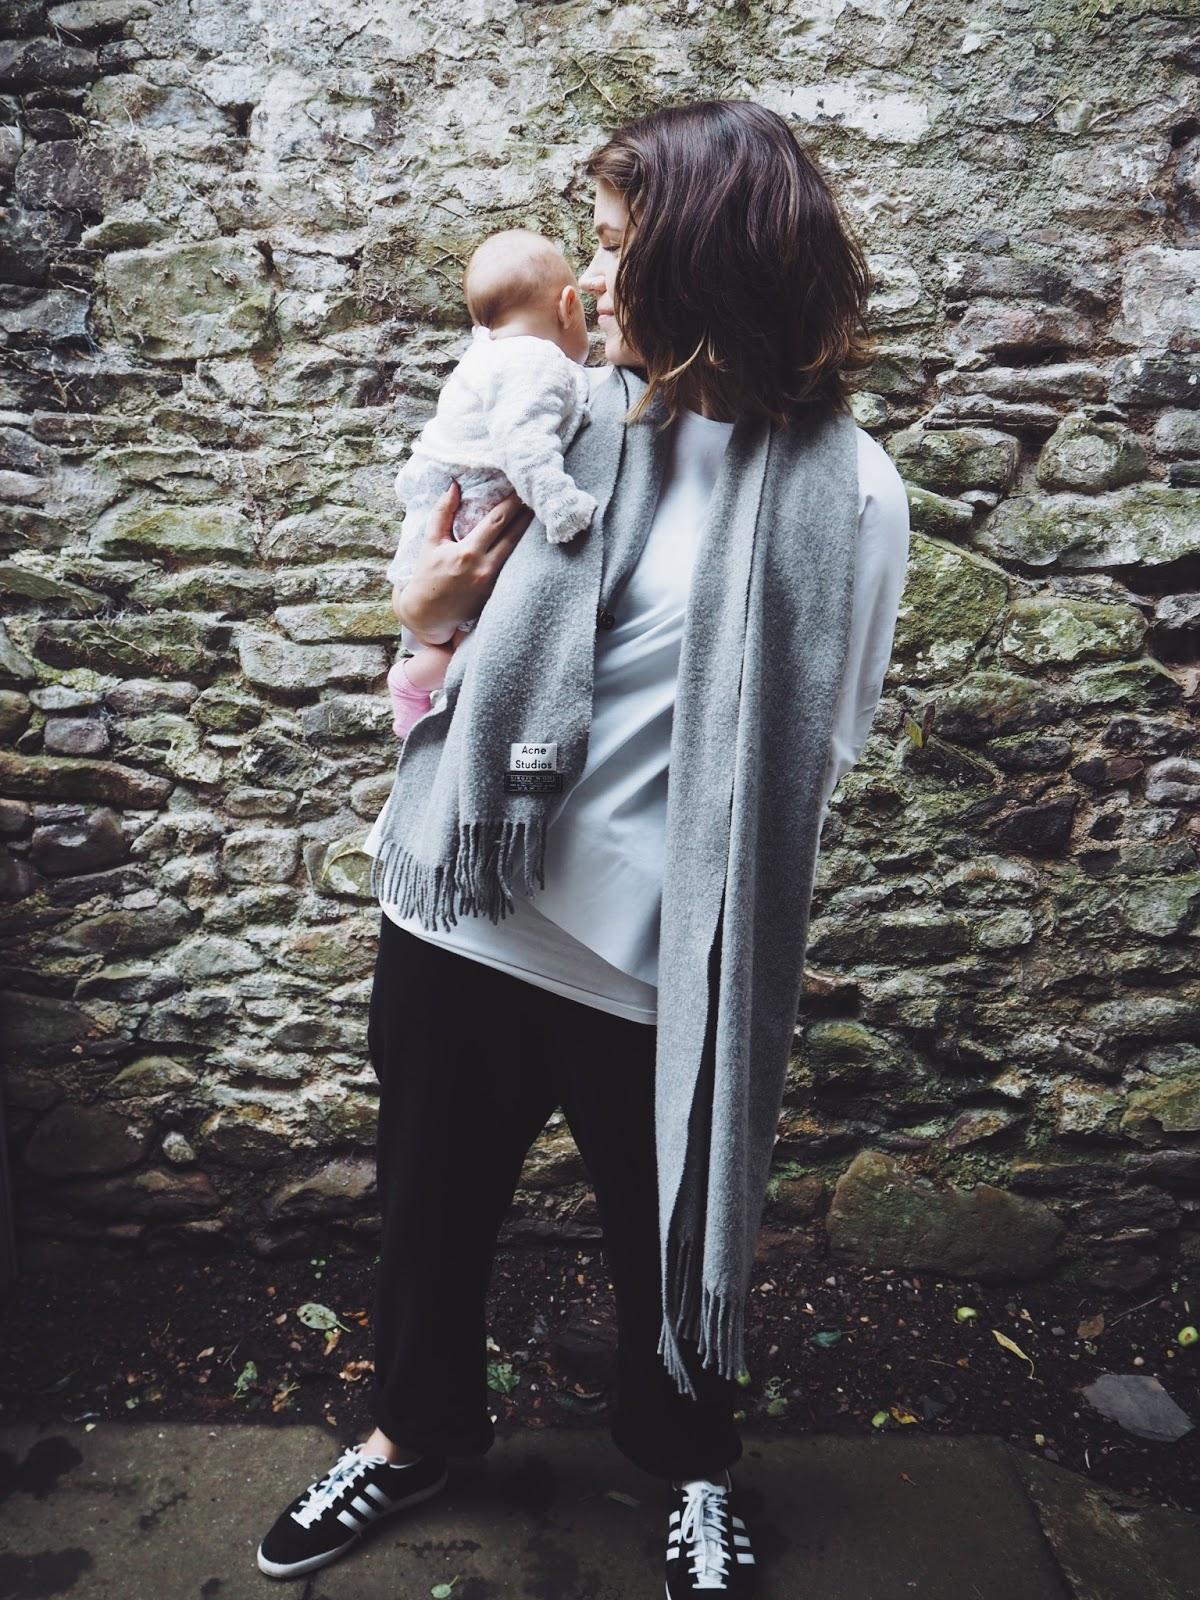 STALF EASYWEAR- Postpartum style